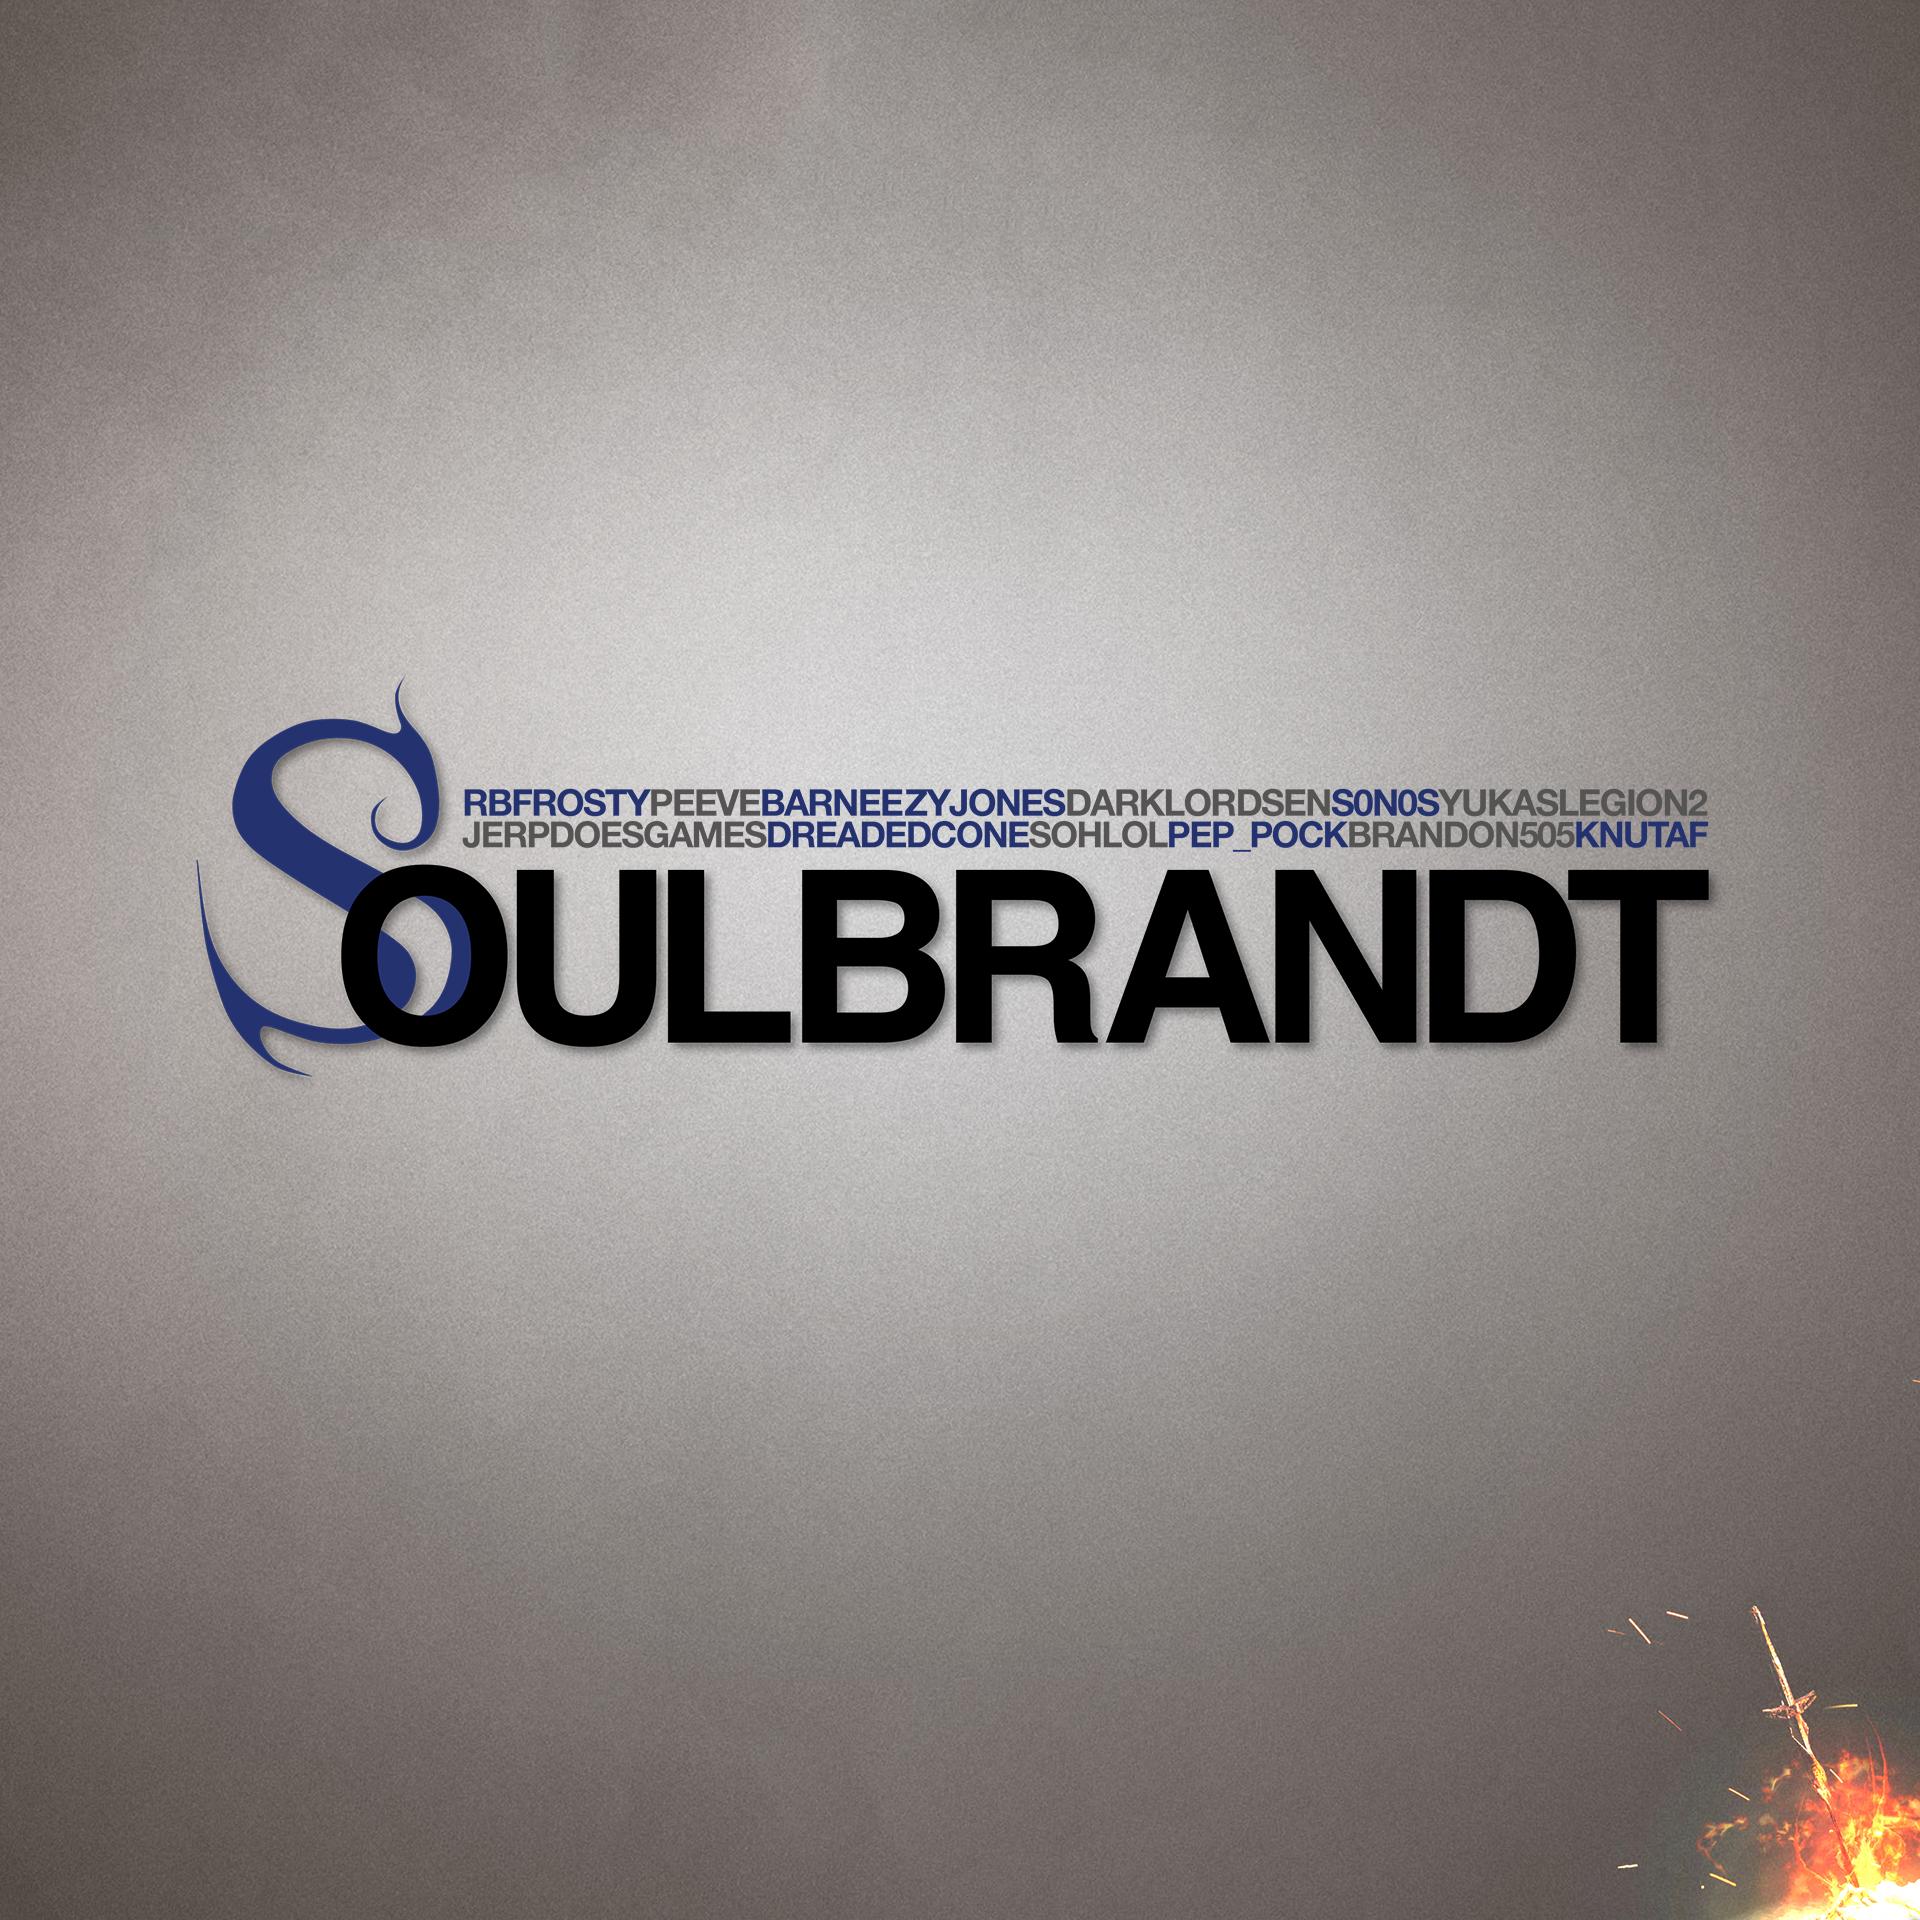 Soulbrandt